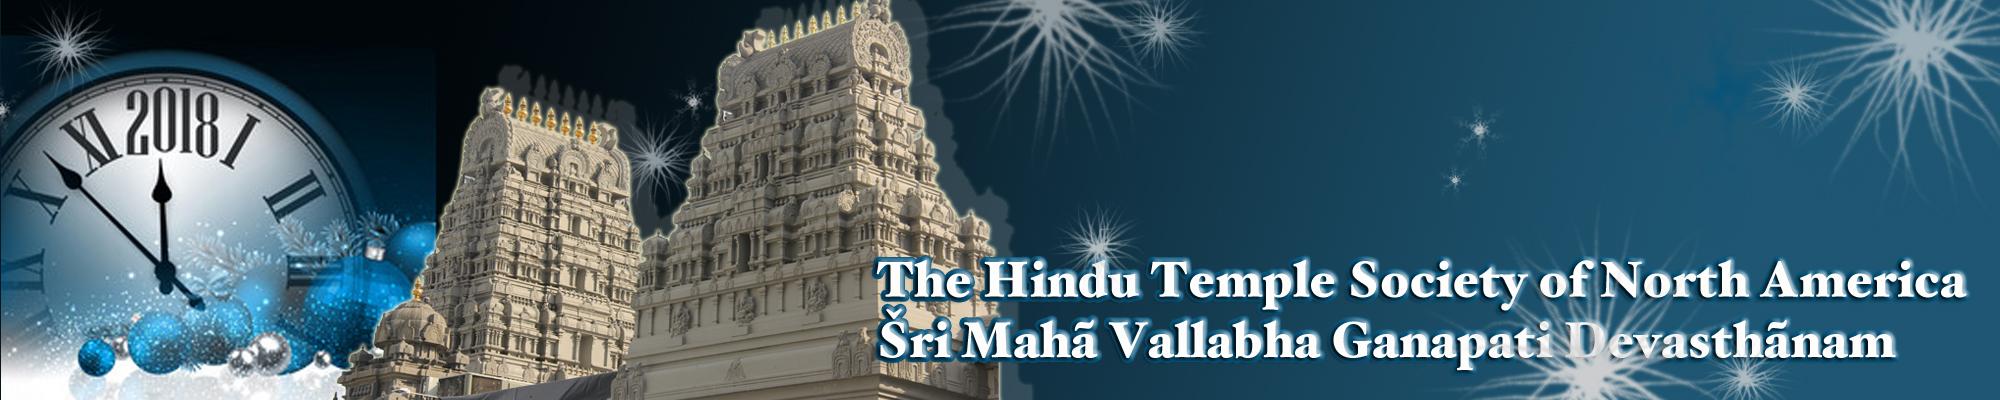 Maha Vallabha Ganapati Devasthanam